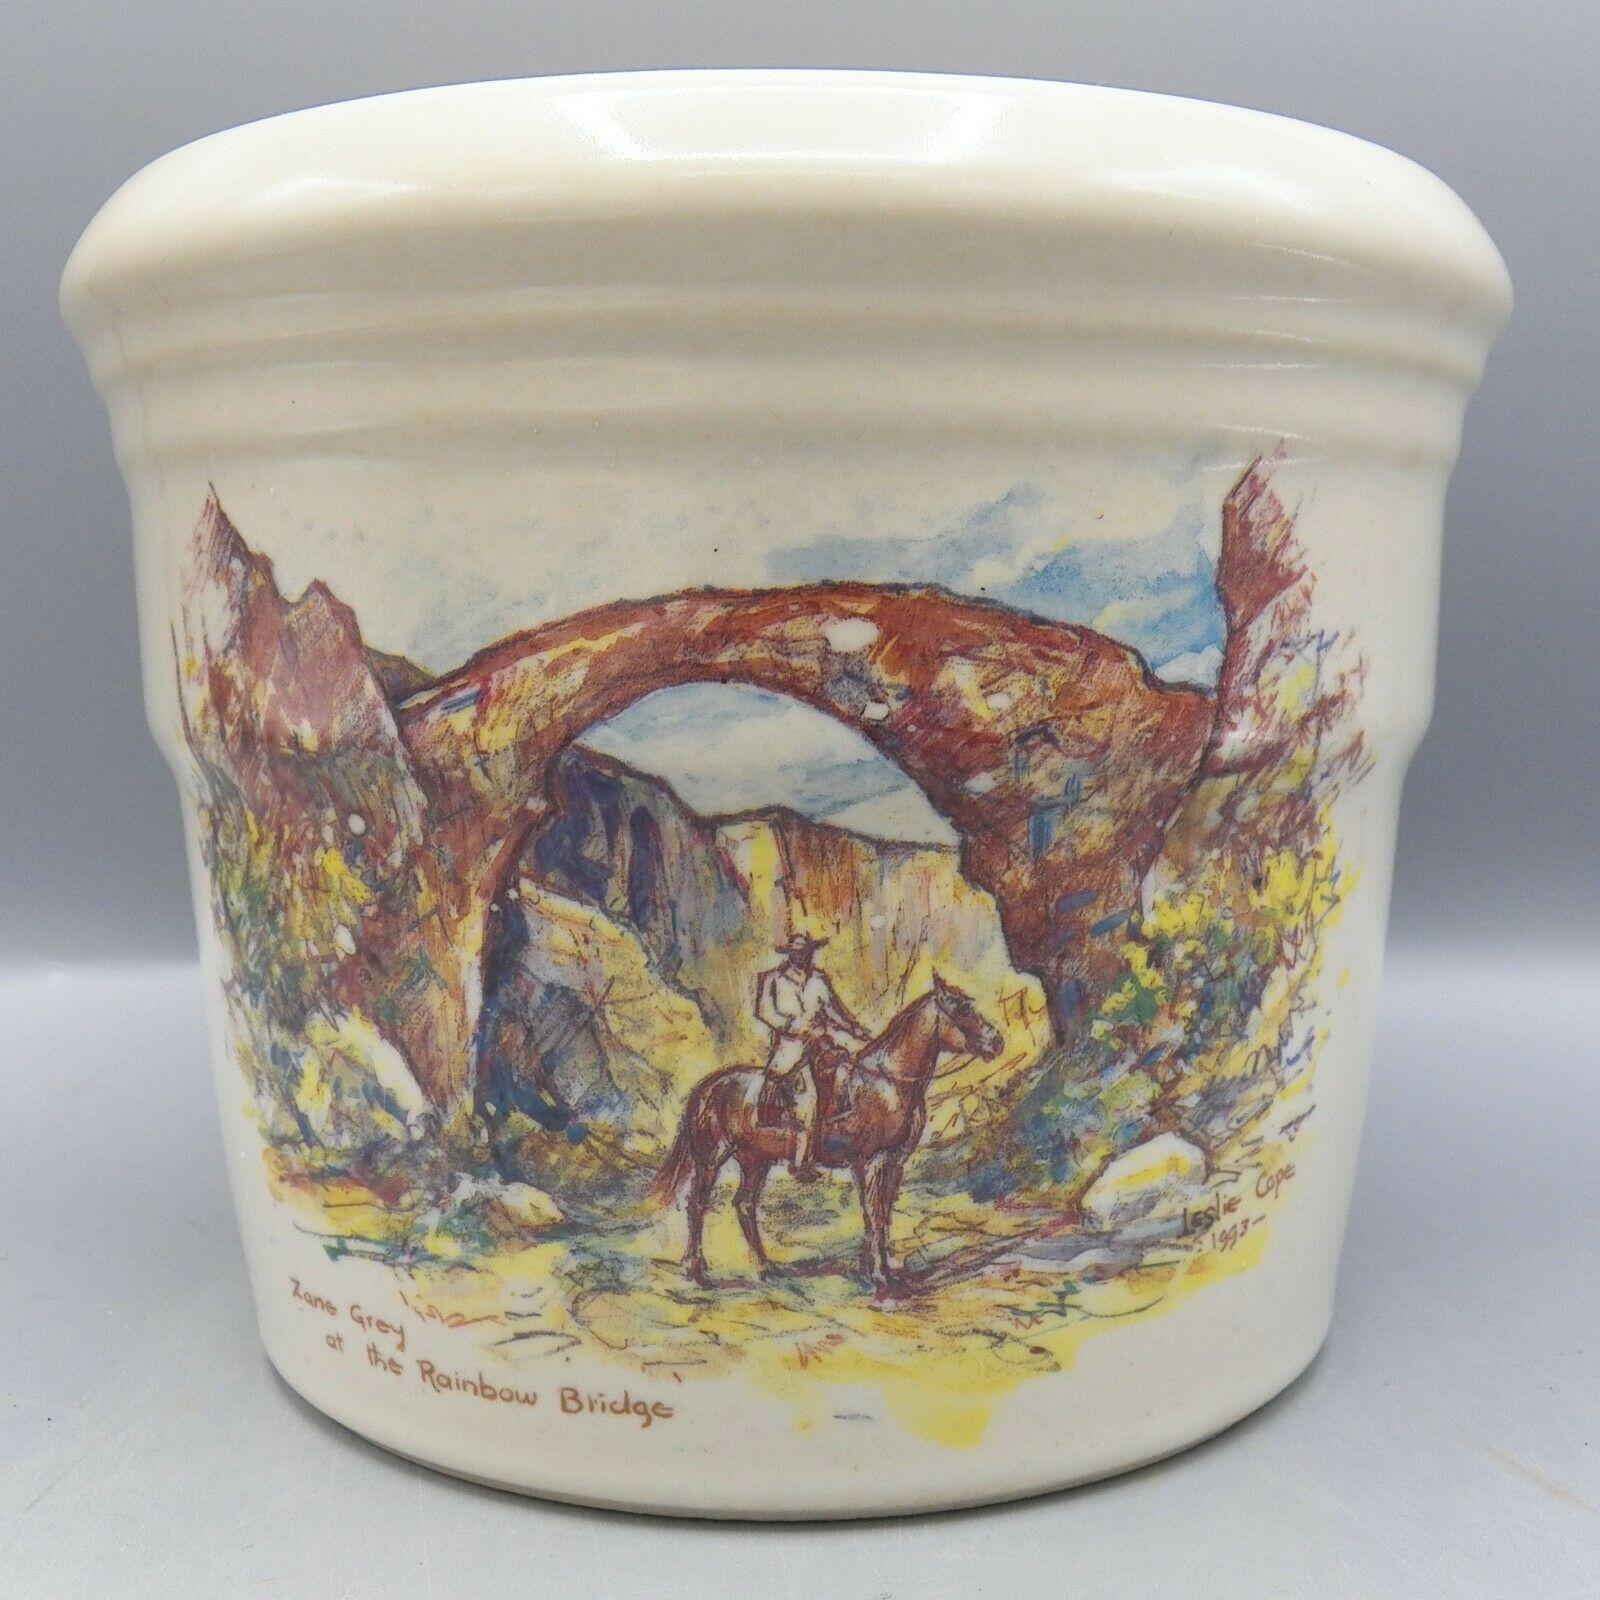 Zanesville Stoneware Zane Grey At Rainbow Bridge Leslie Cope Vase Pot Pottery image 2